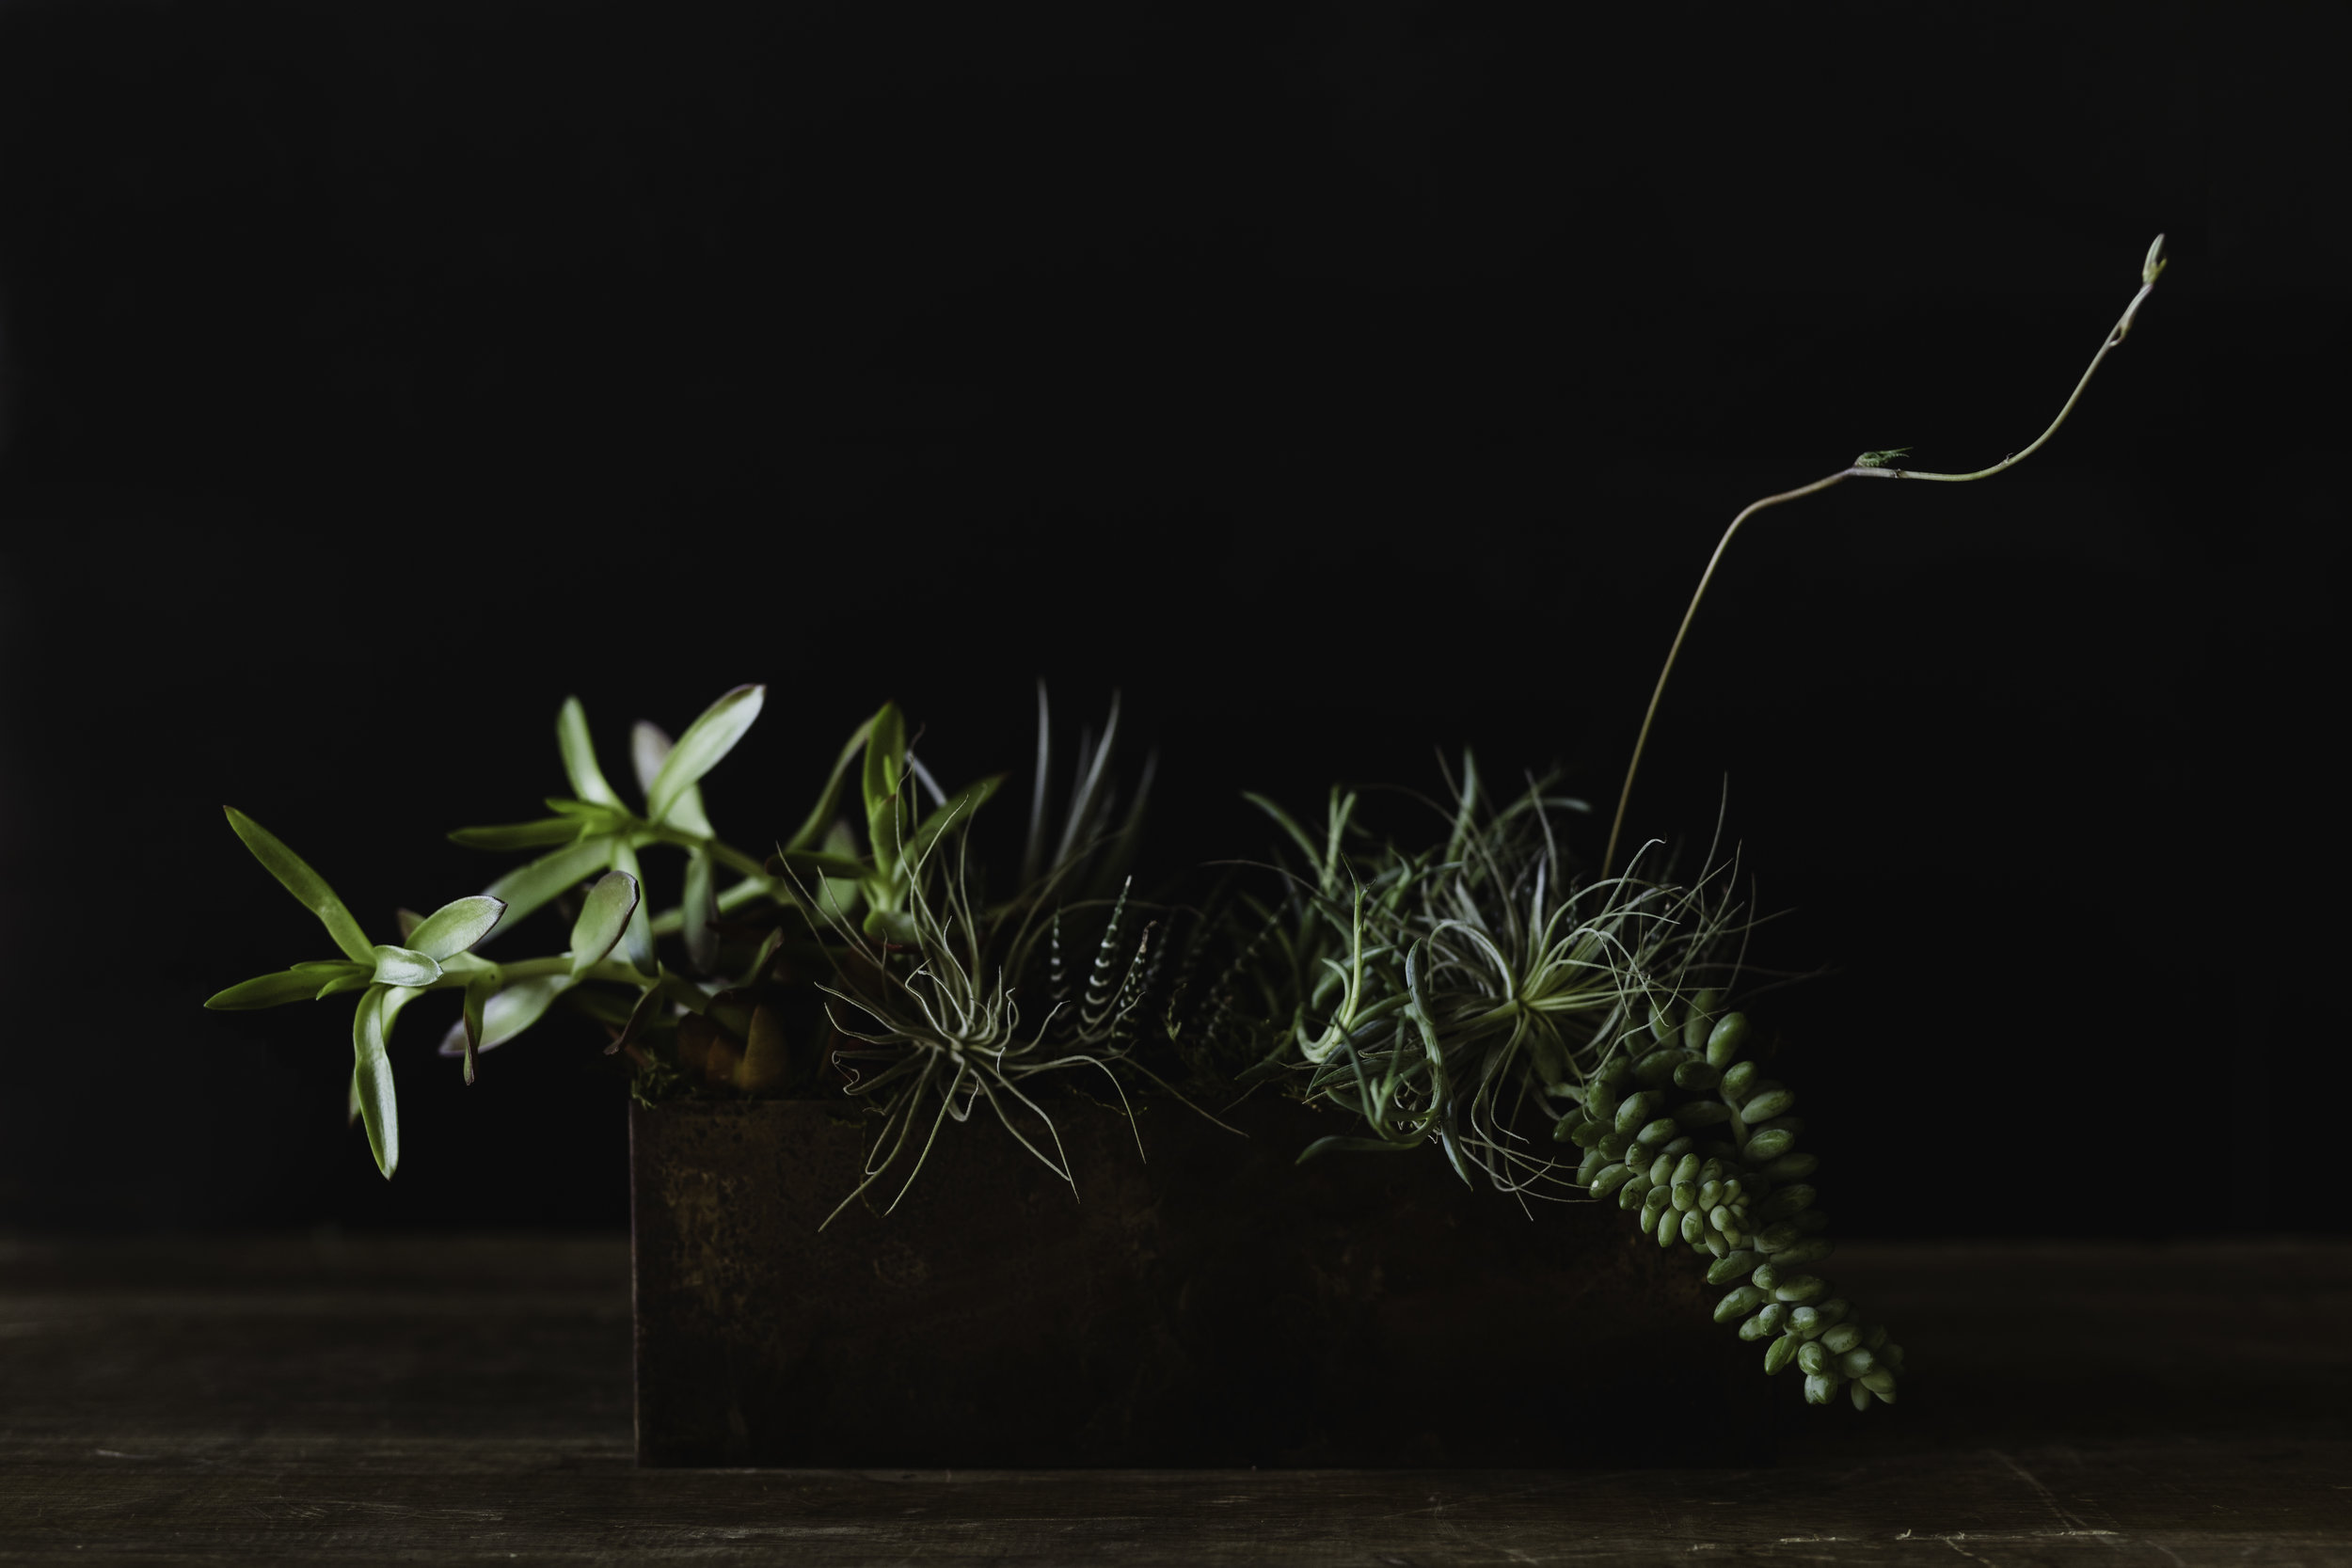 succulentarrangement_warehouse-amoncarter.jpg